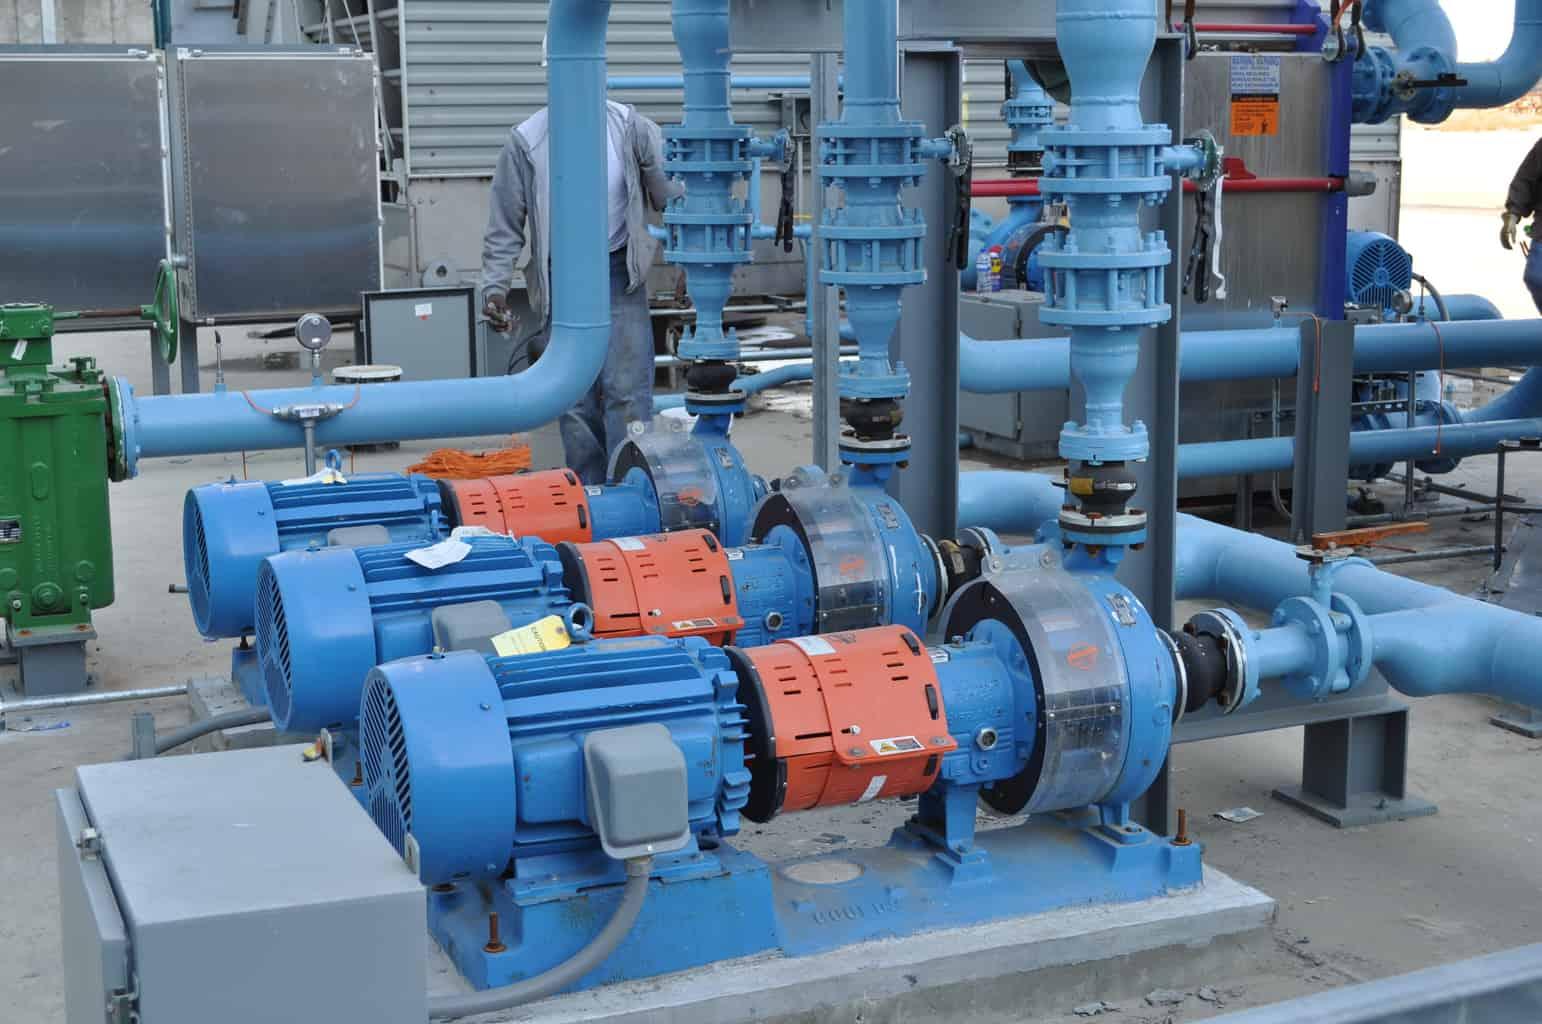 ANSI-Pumps-With-Uniguards